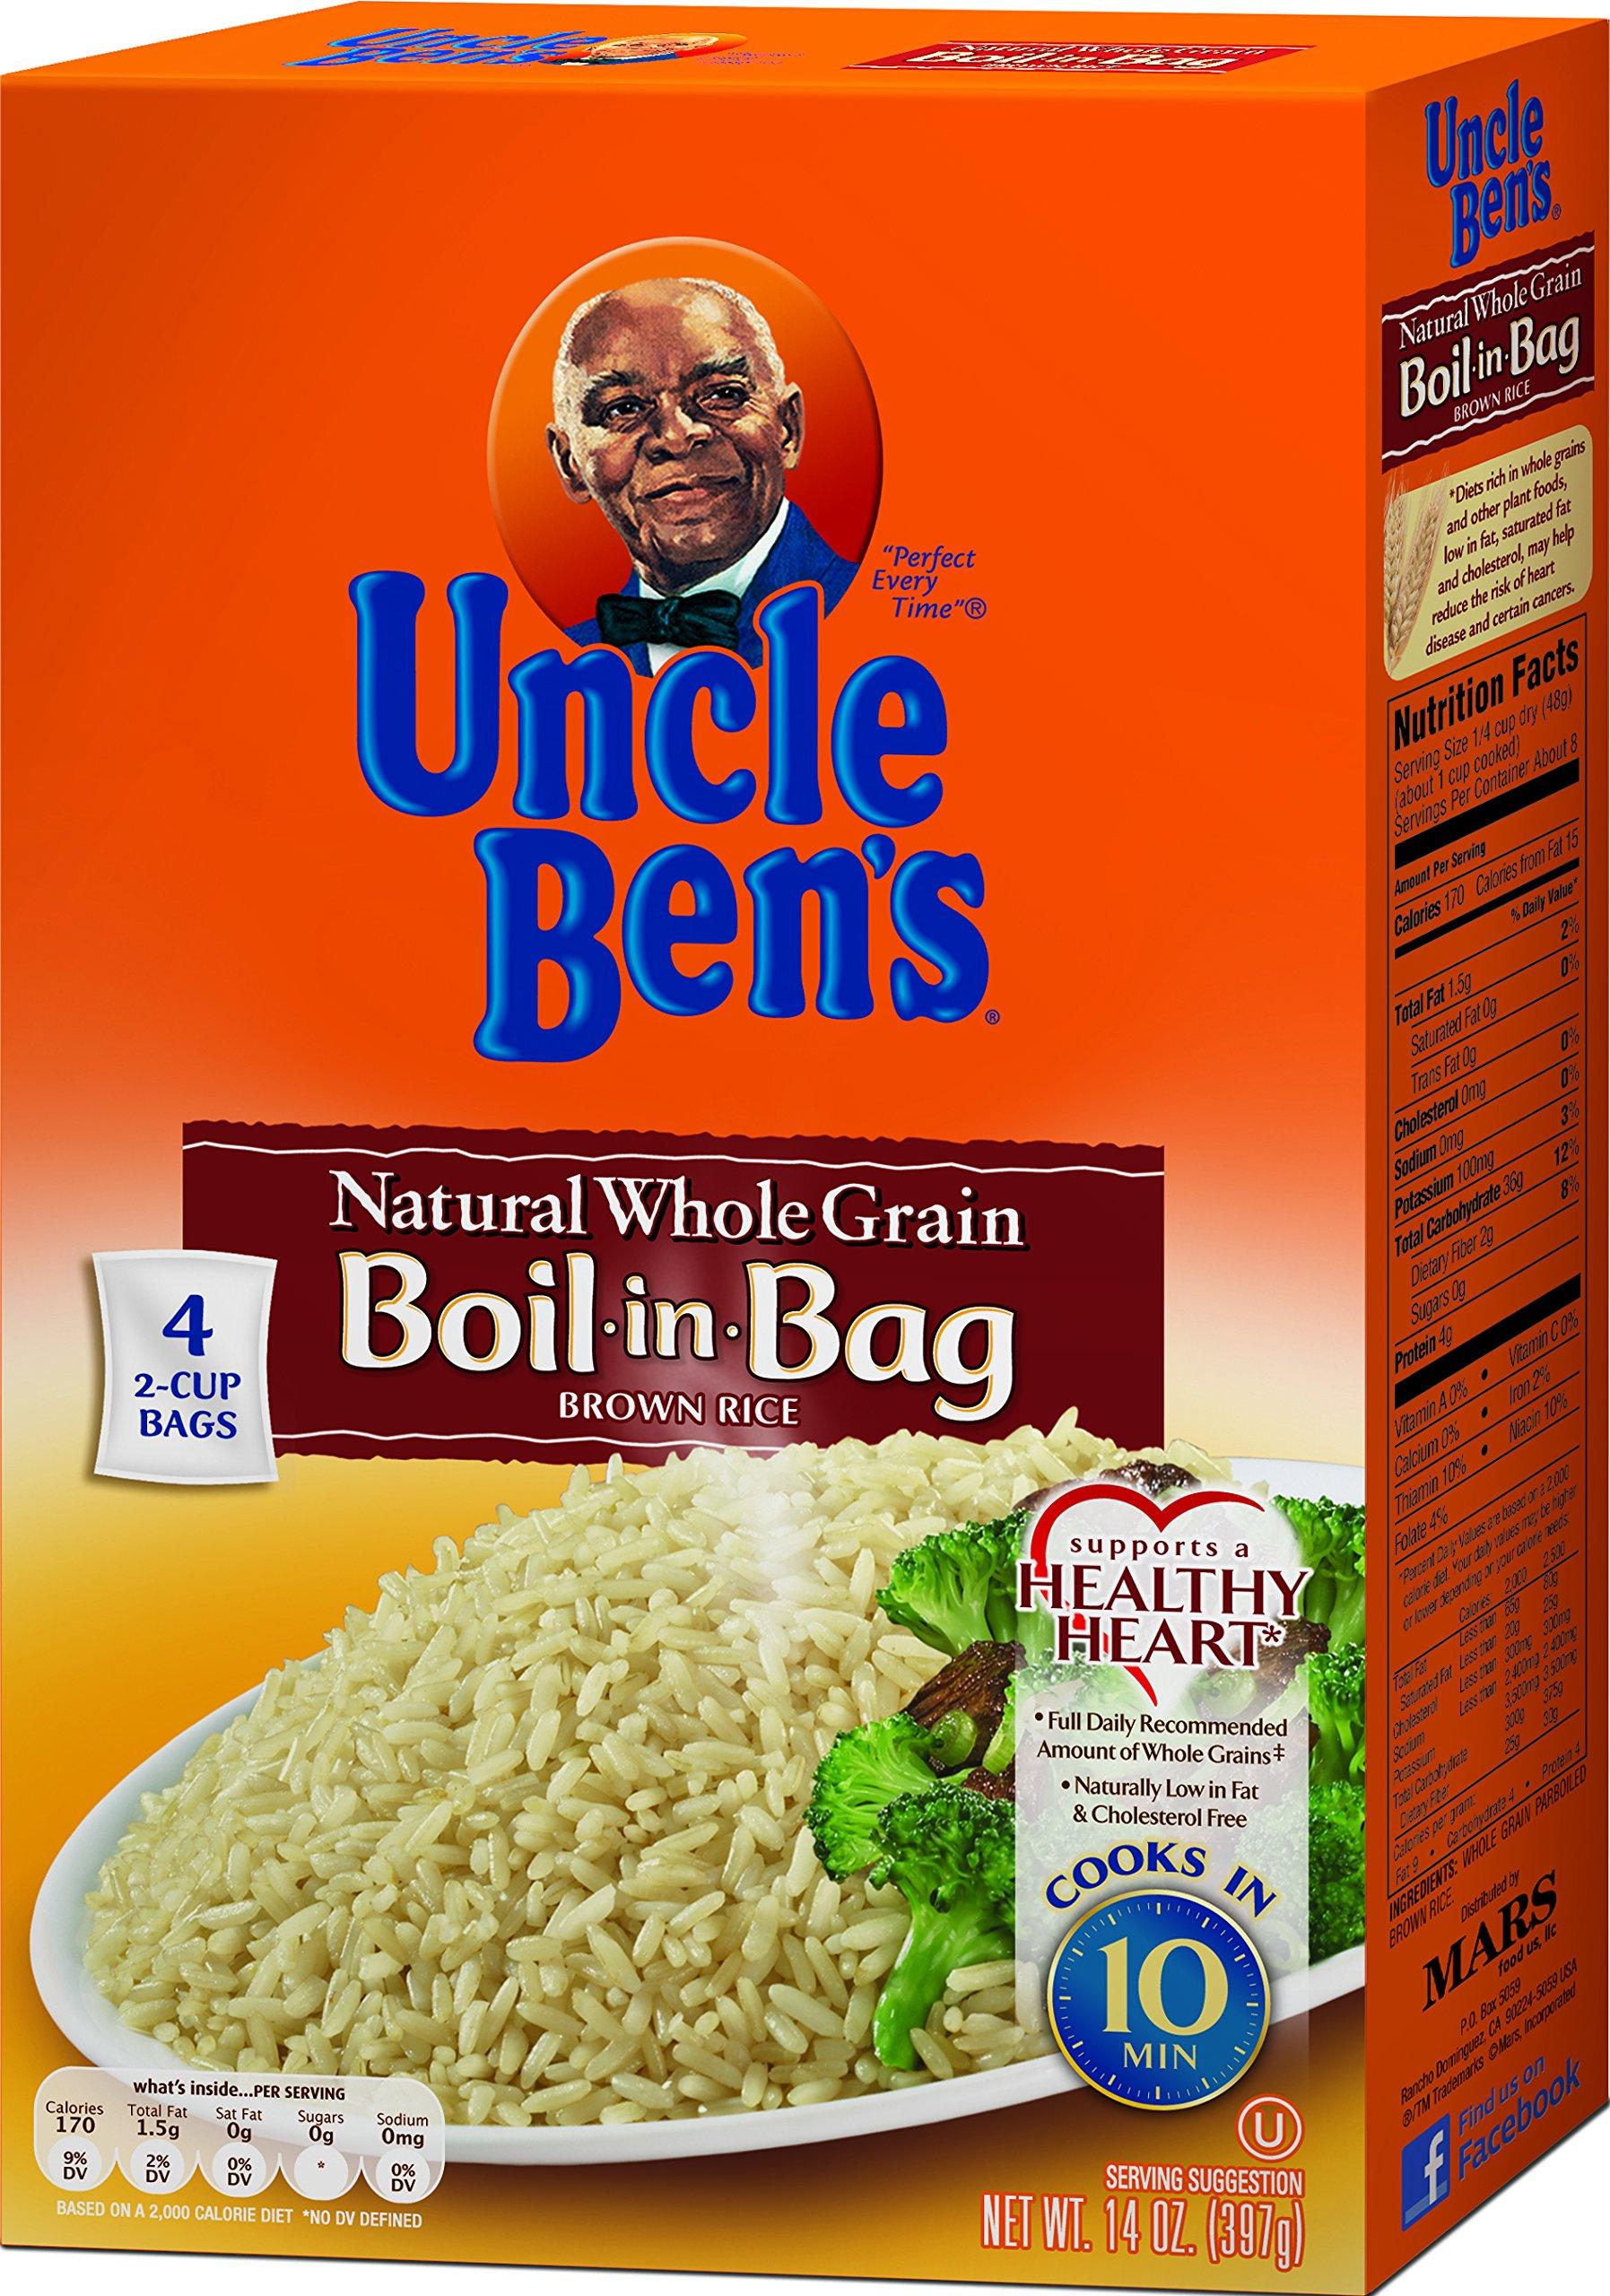 UNCLE BEN'S Boil-in-Bag Whole Grain Brown (12pk)